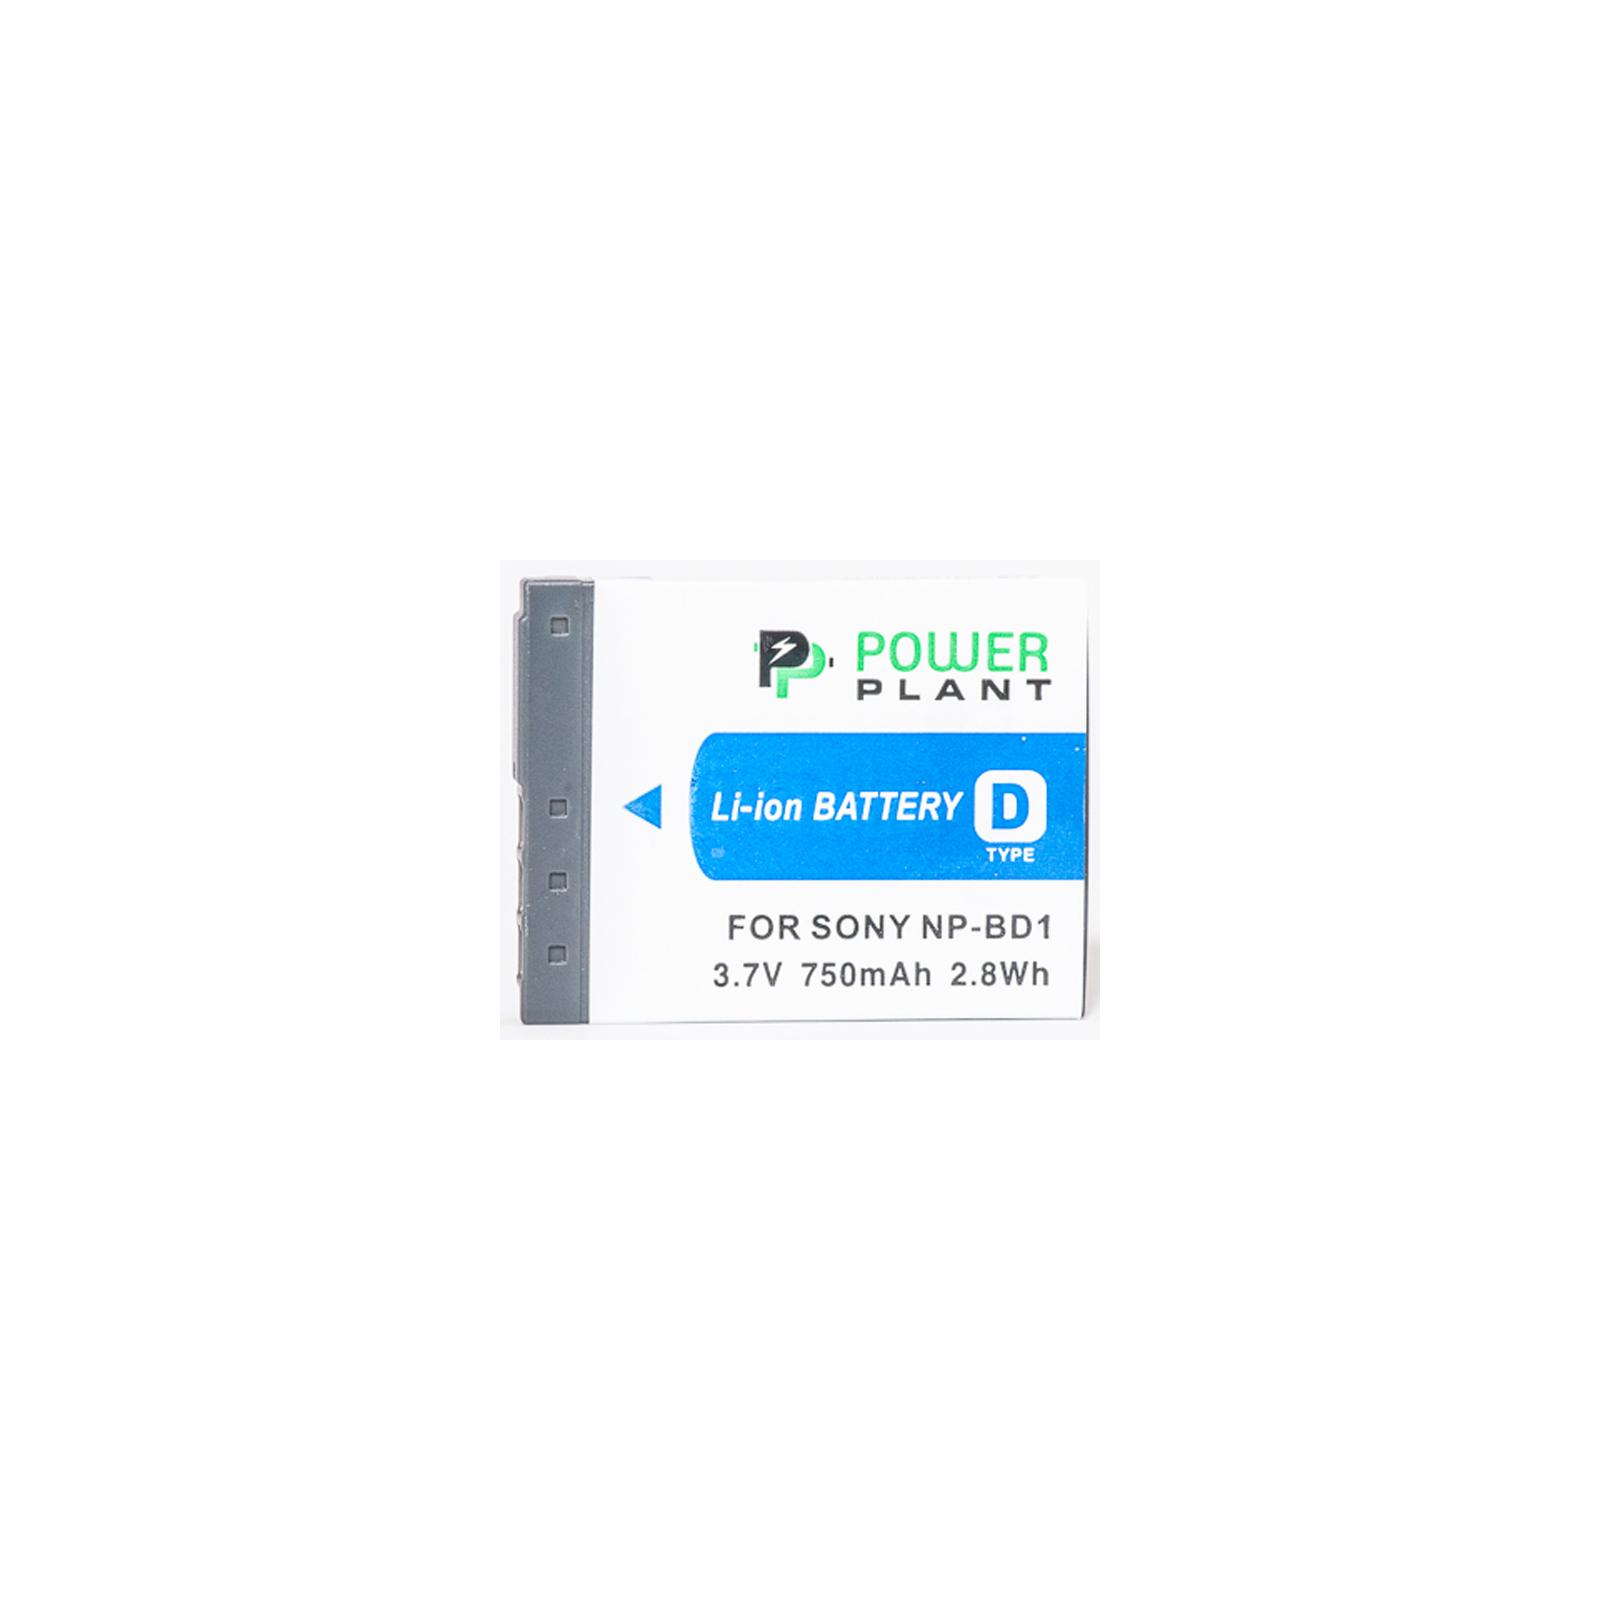 Аккумулятор к фото/видео PowerPlant Sony NP-BD1, NP-FD1 (DV00DV1204) изображение 2